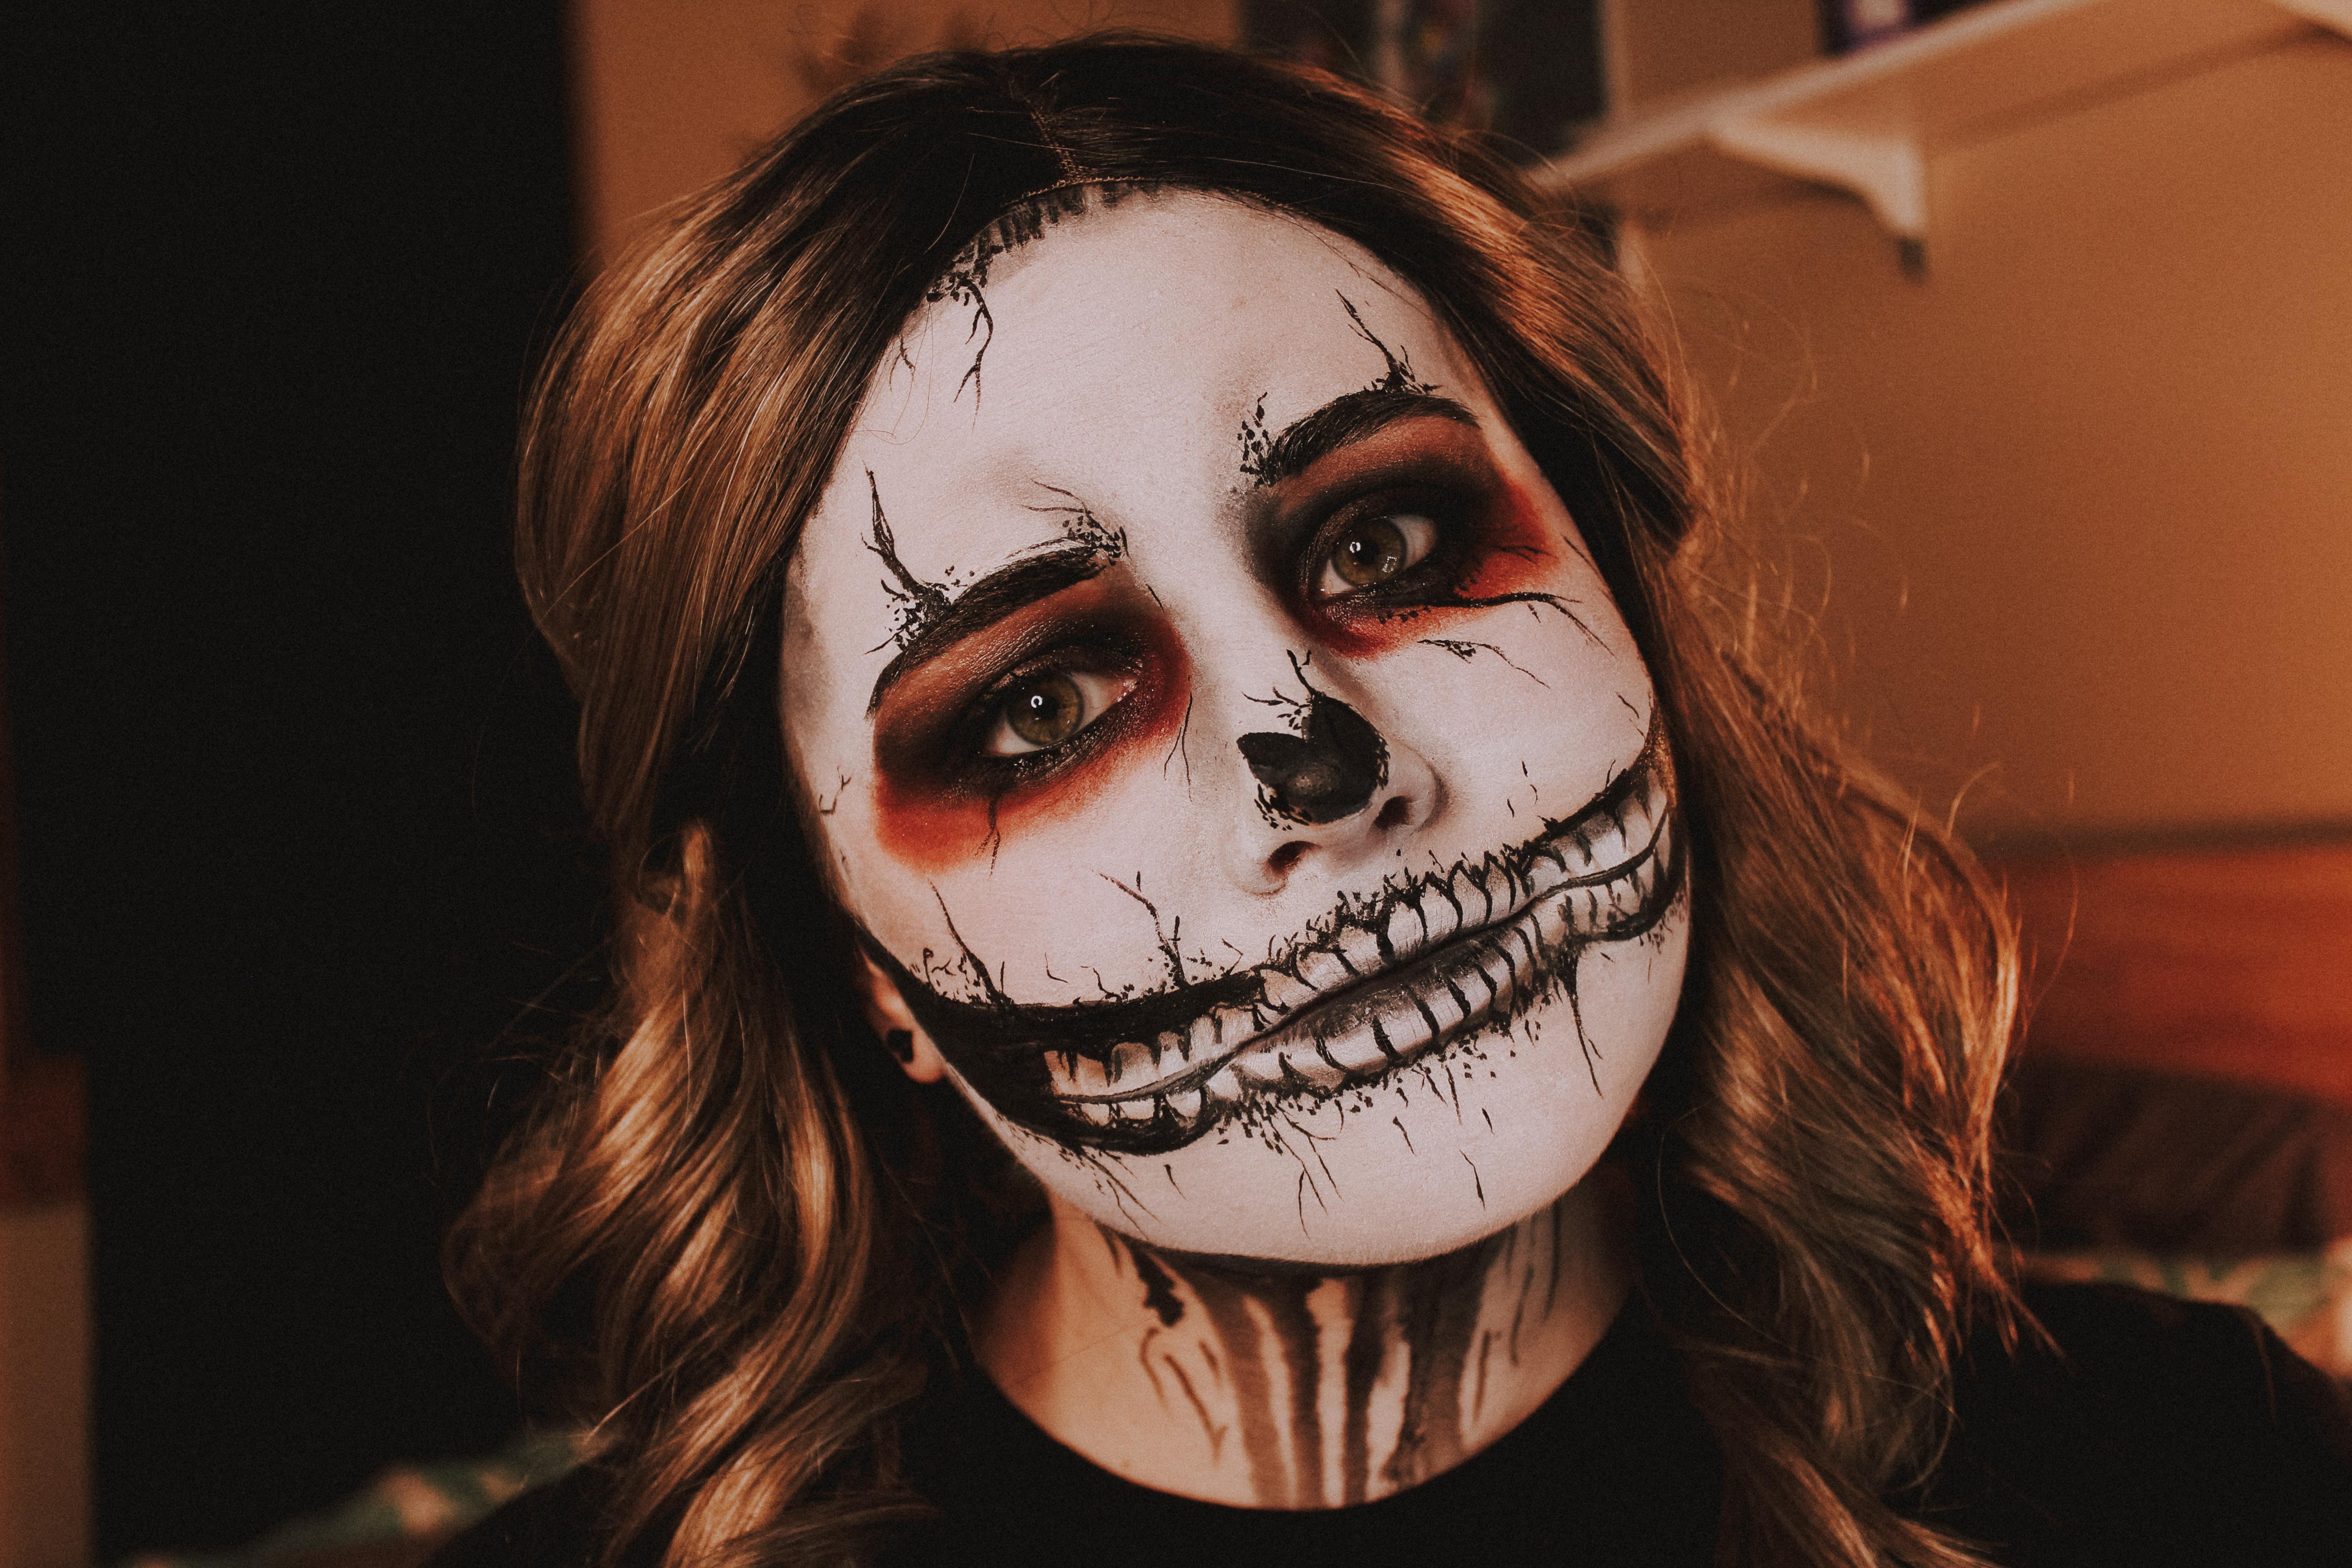 Grunge Skull Makeup 3